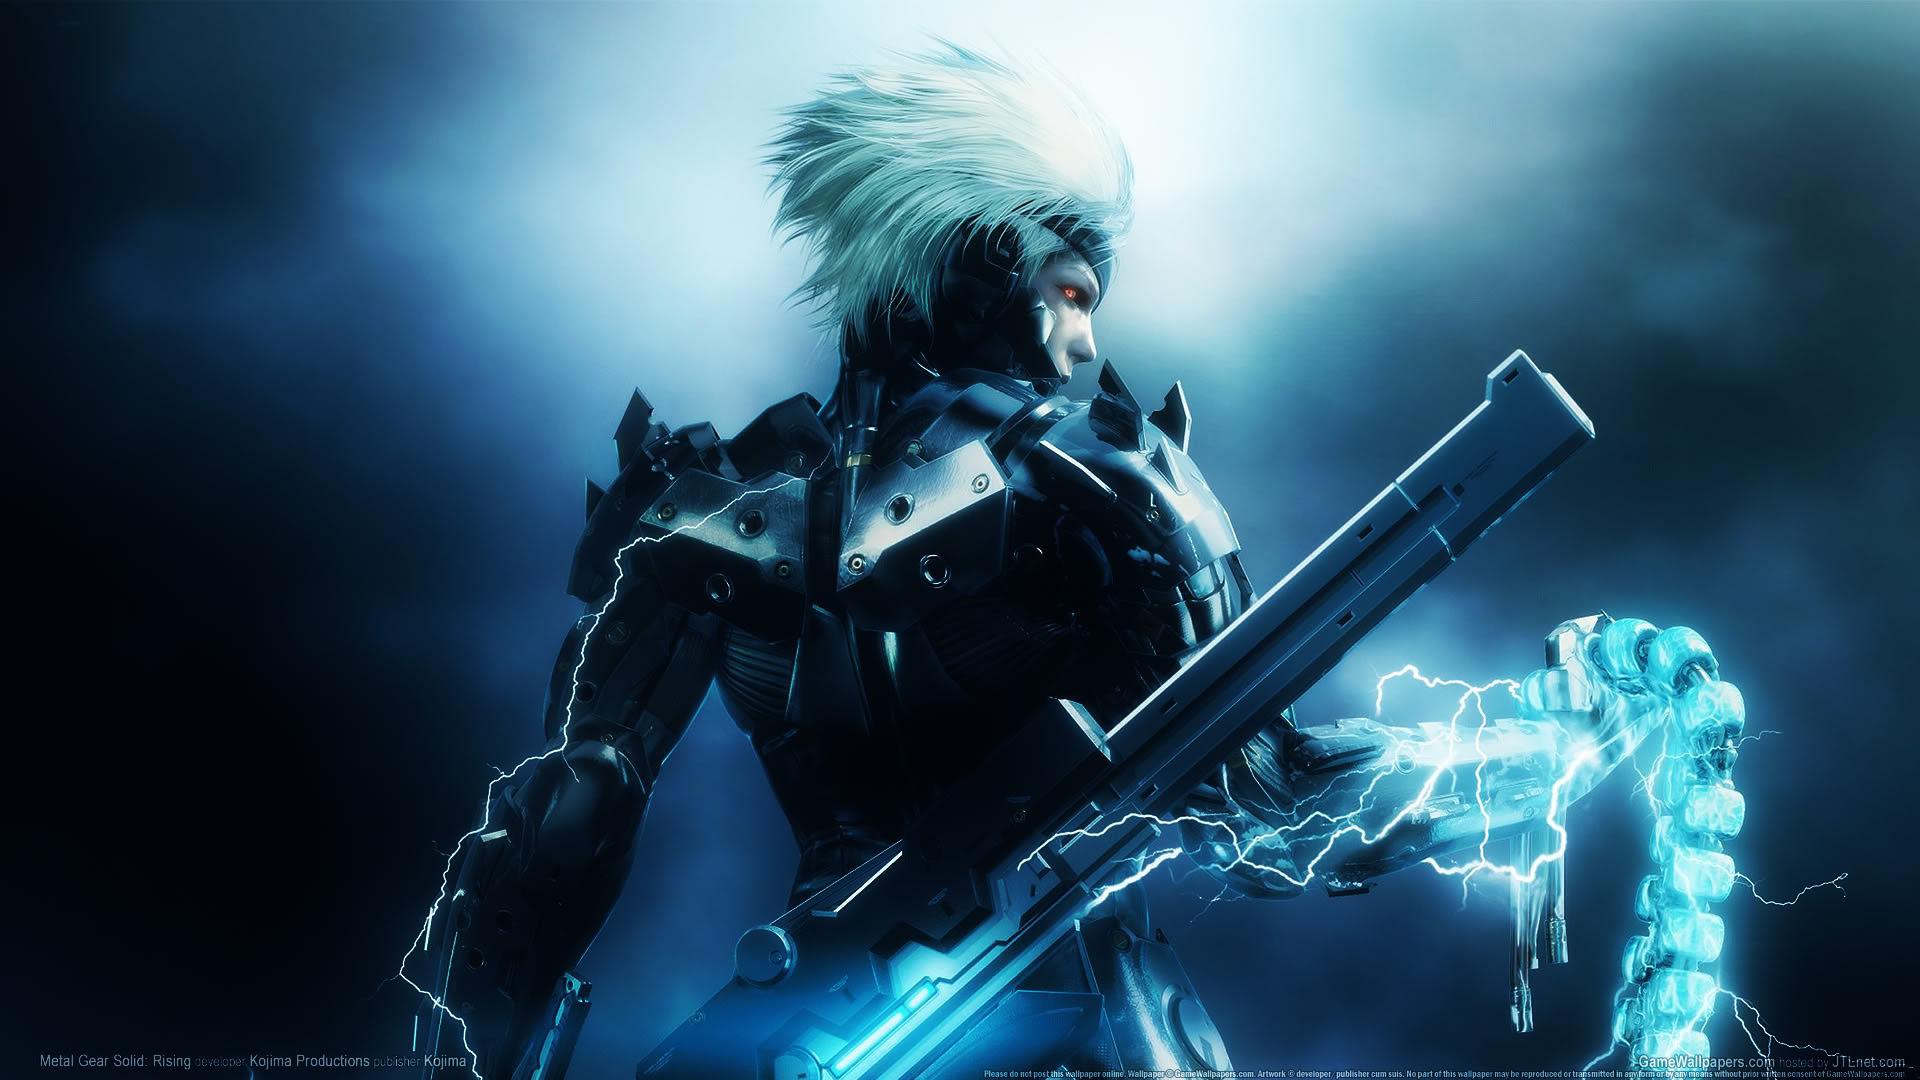 Electric Ninja Cyborg Robot